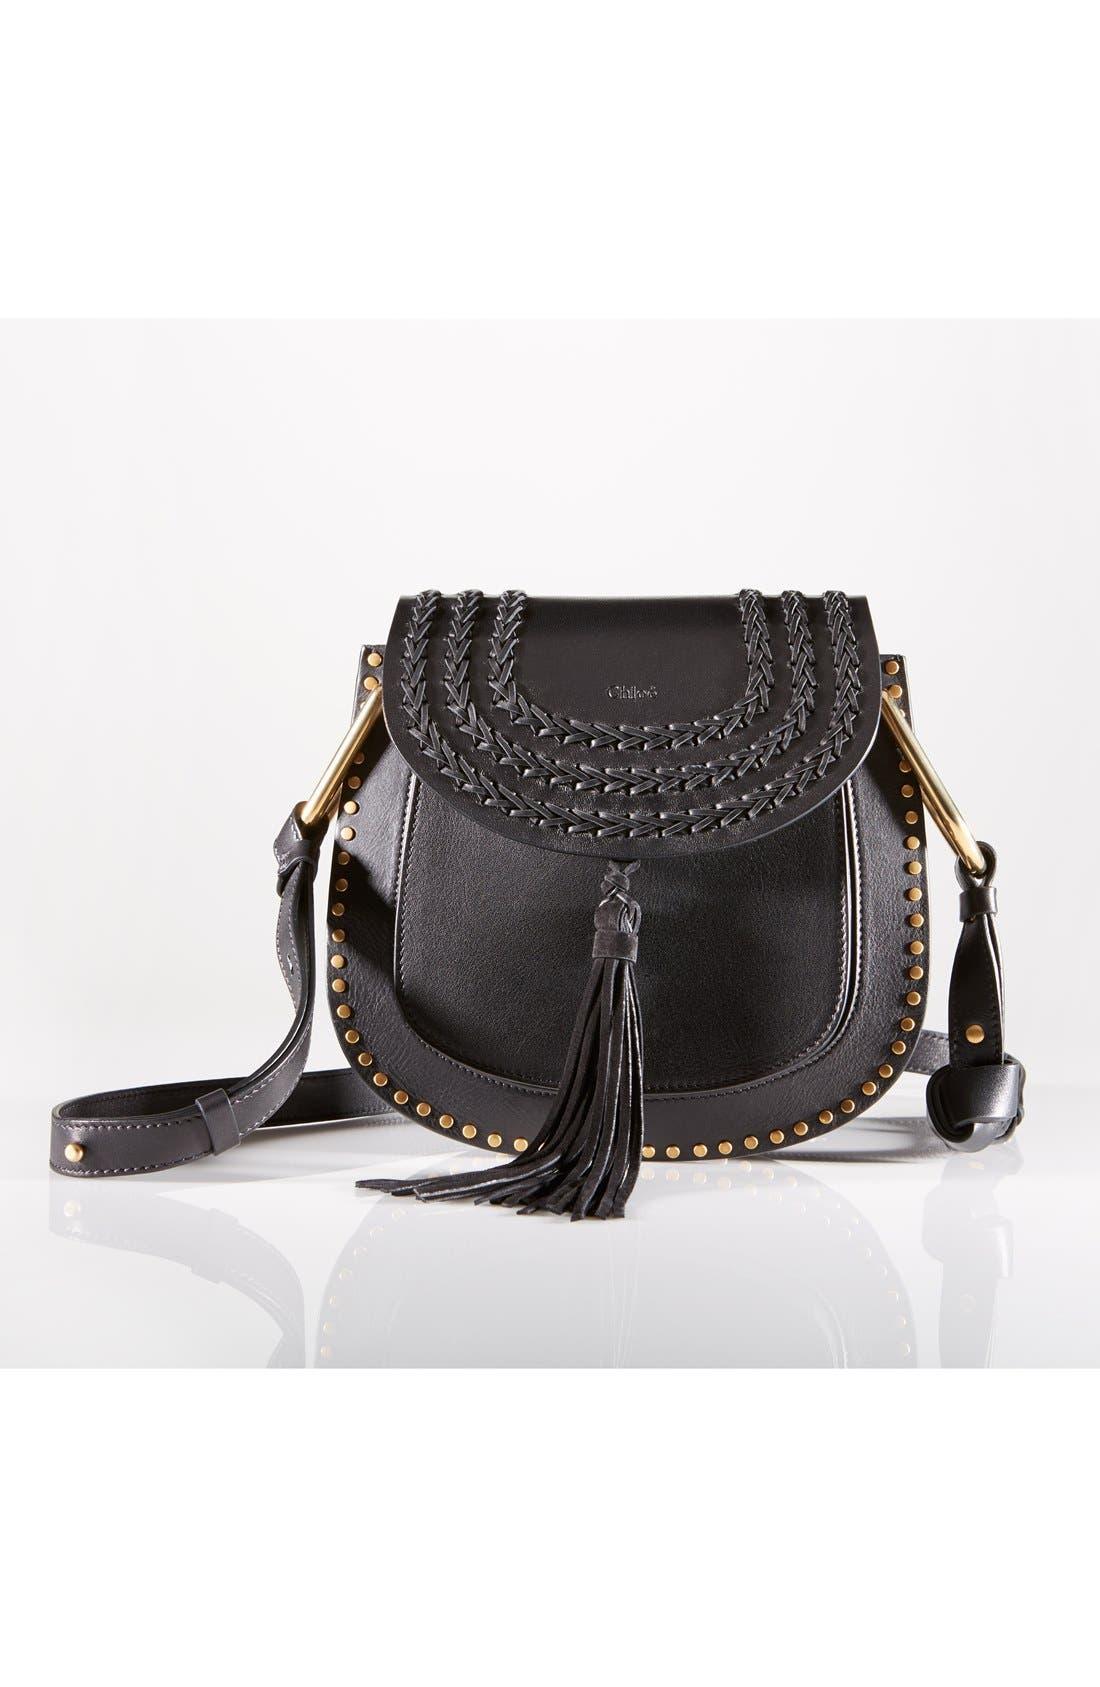 'Small Hudson' Studded Calfskin Leather Crossbody Bag,                             Alternate thumbnail 2, color,